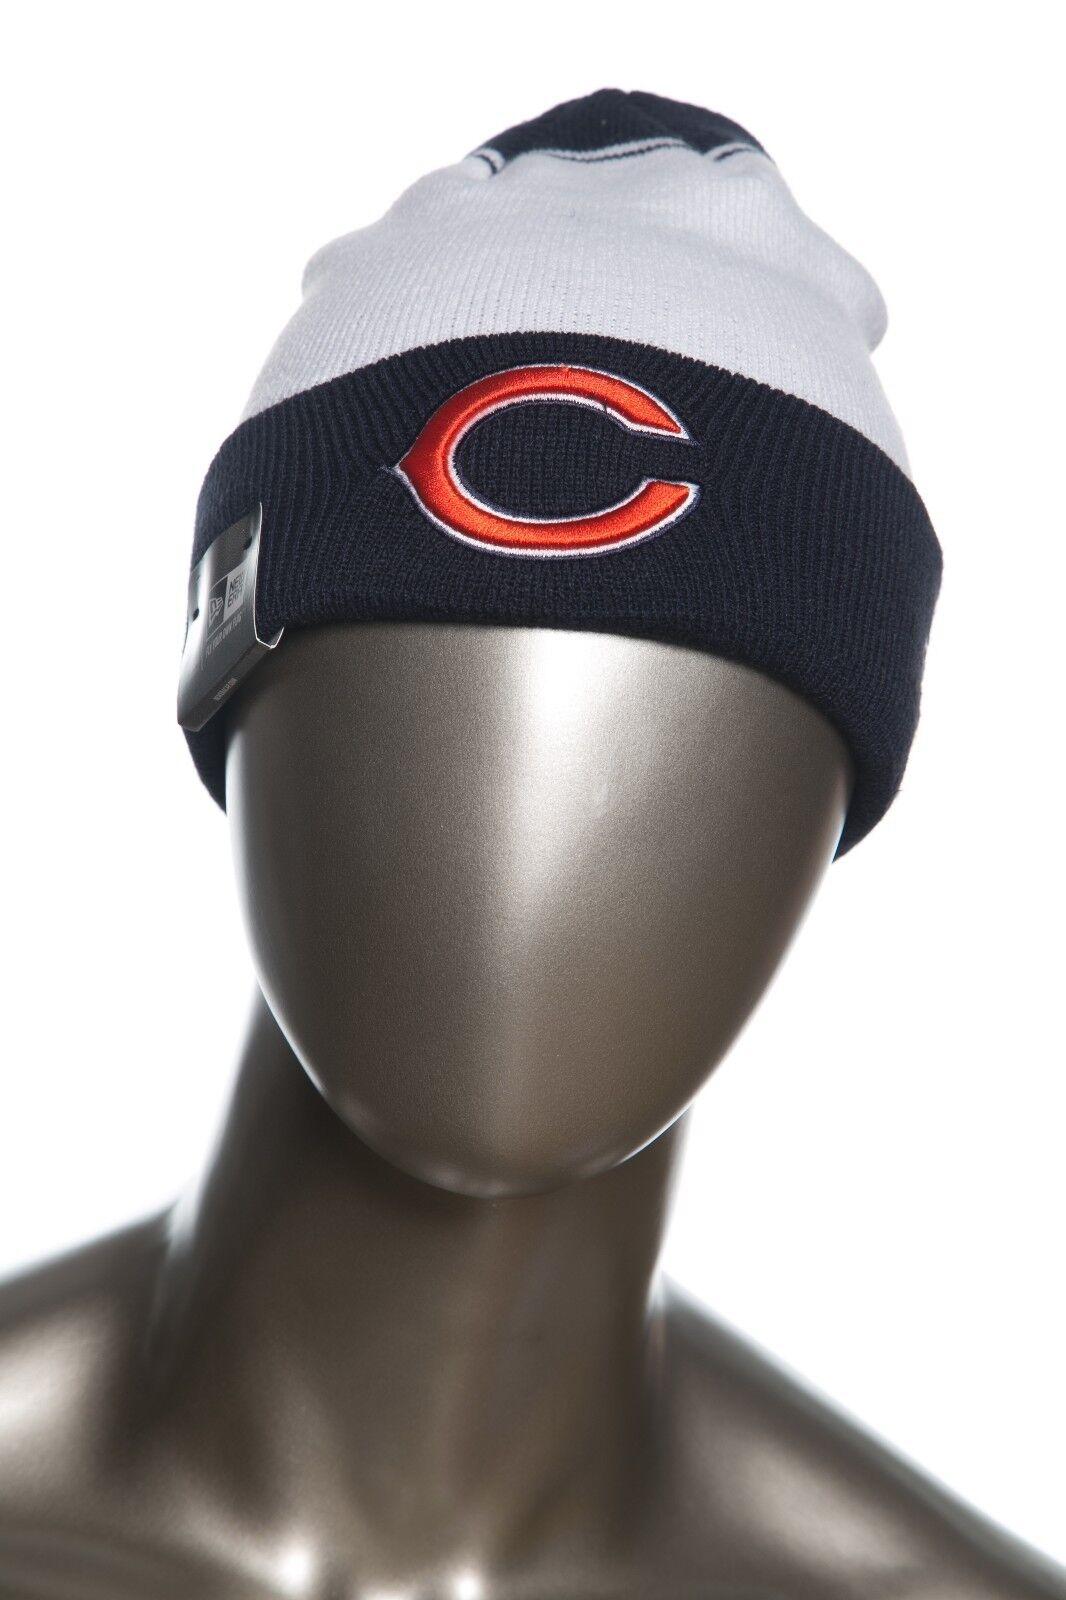 New Era NFL Team Cuffed Beanies / Knit Caps Fall with Raised Puff logo